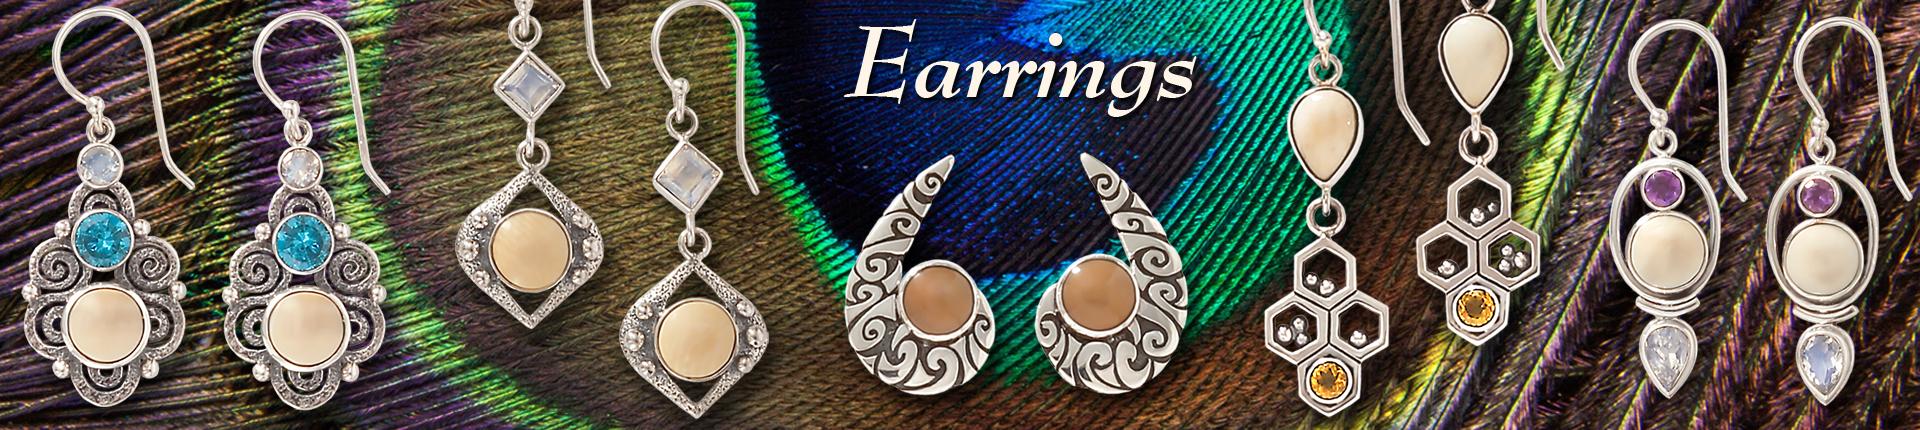 Zealandia fossilized ivory earrings